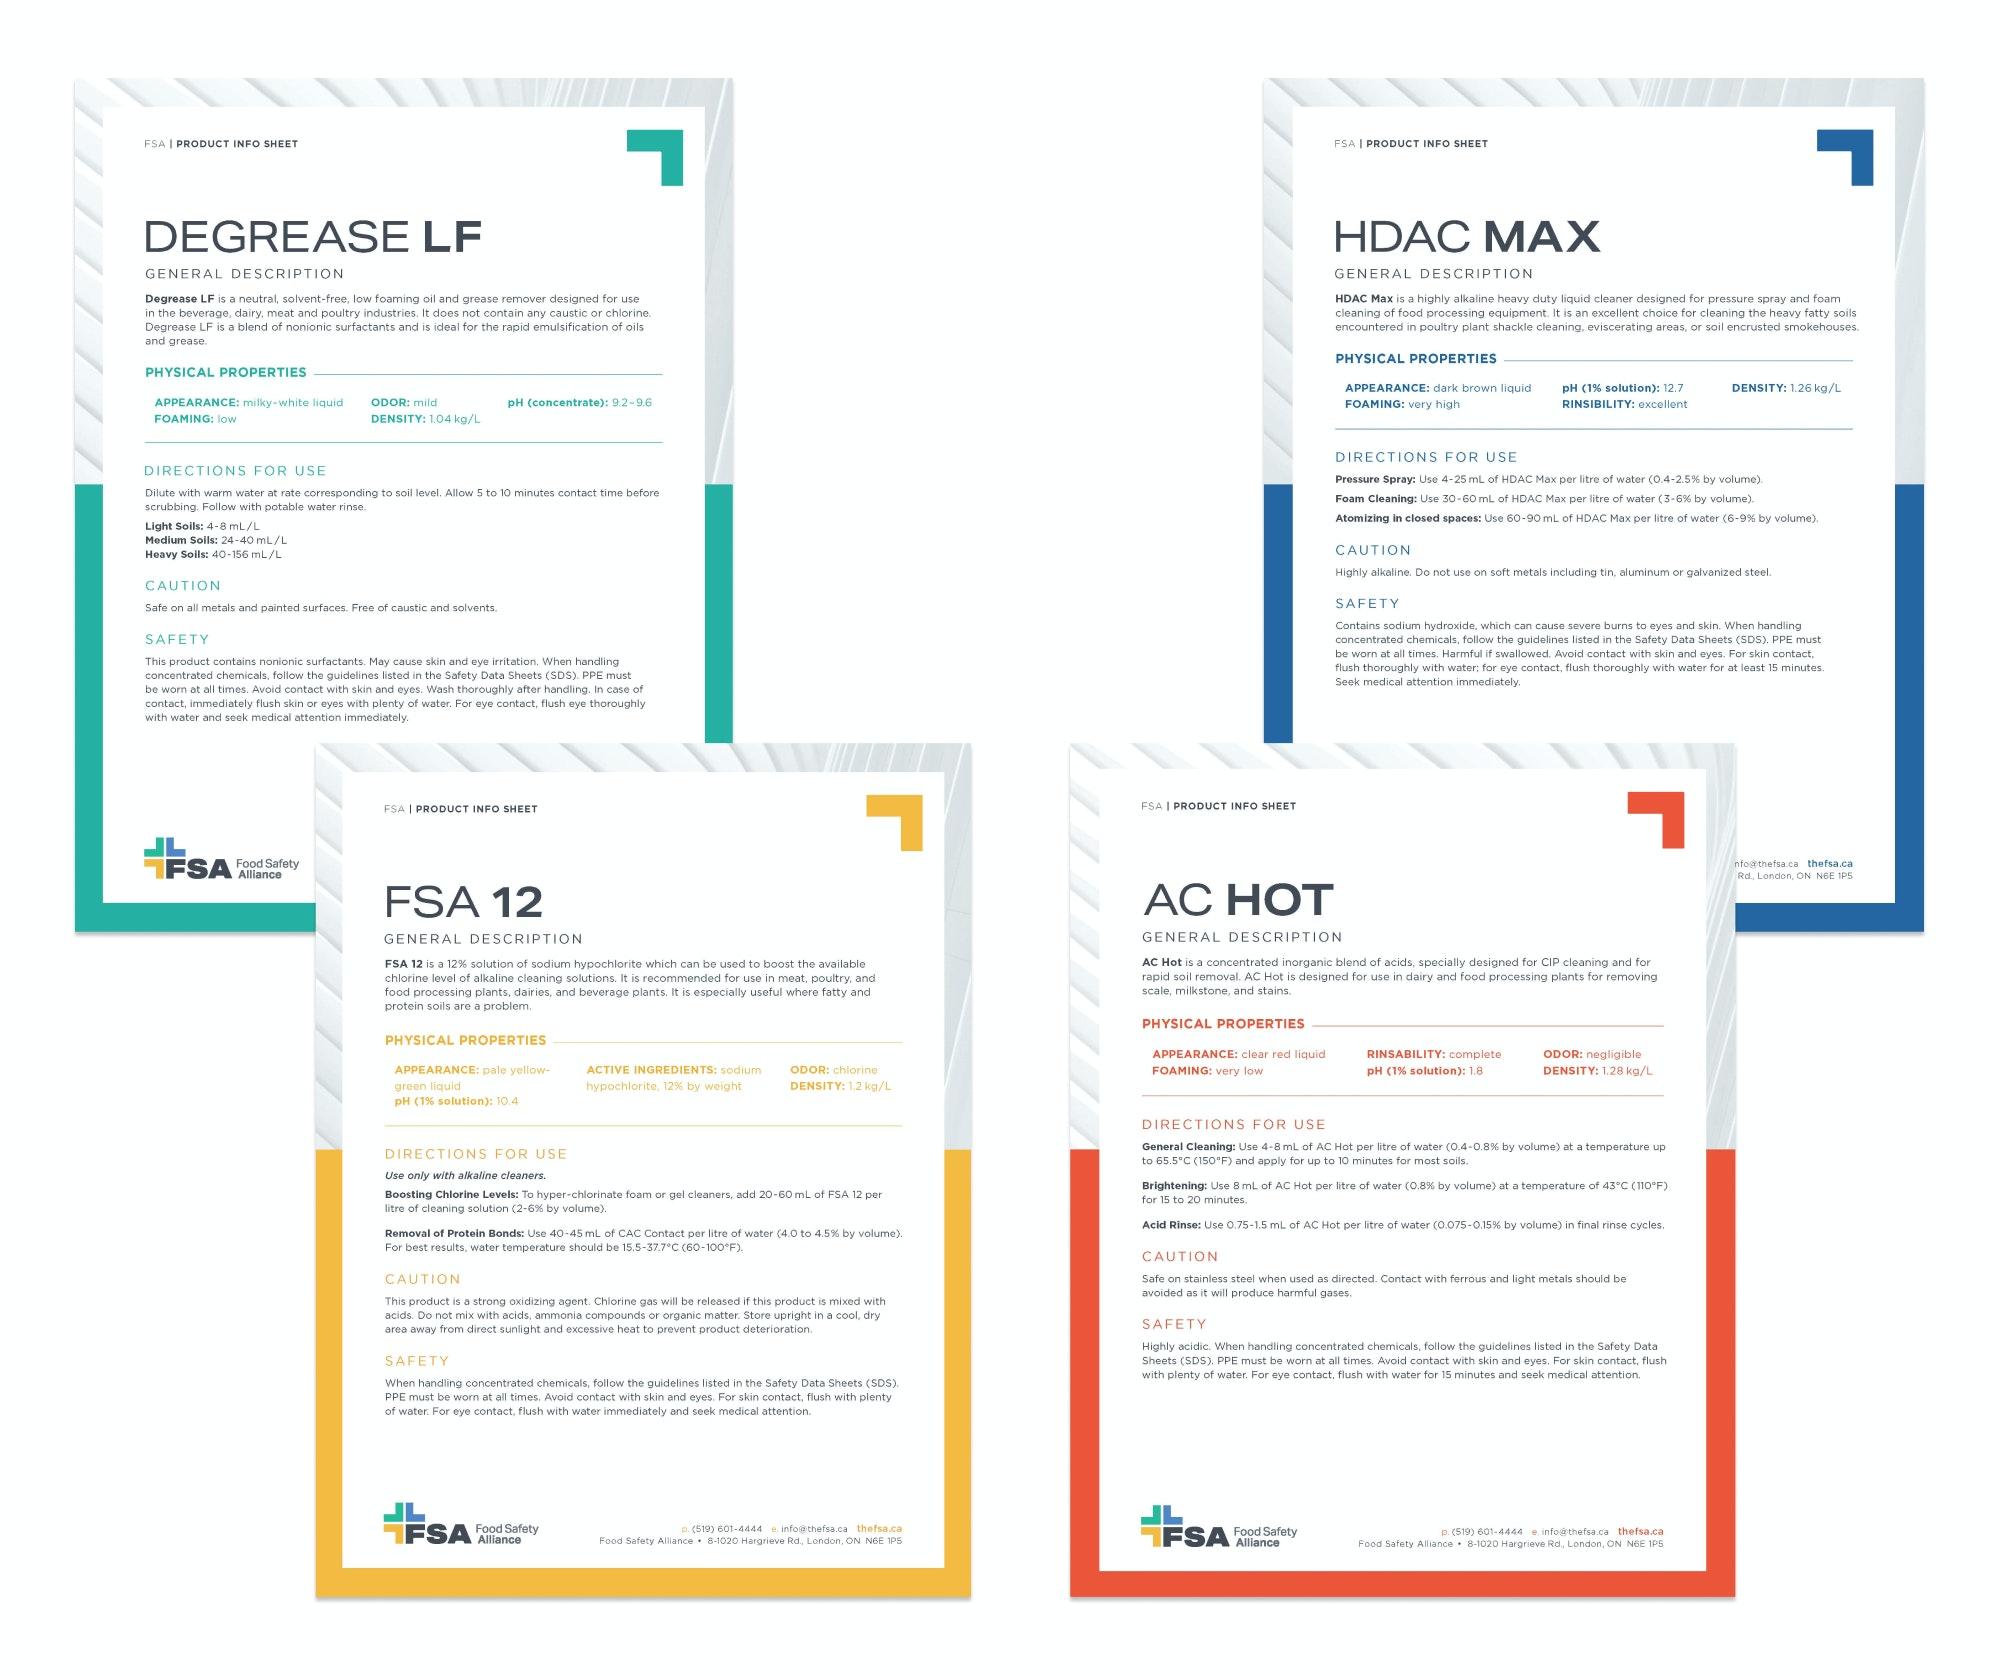 FSA product information sheets